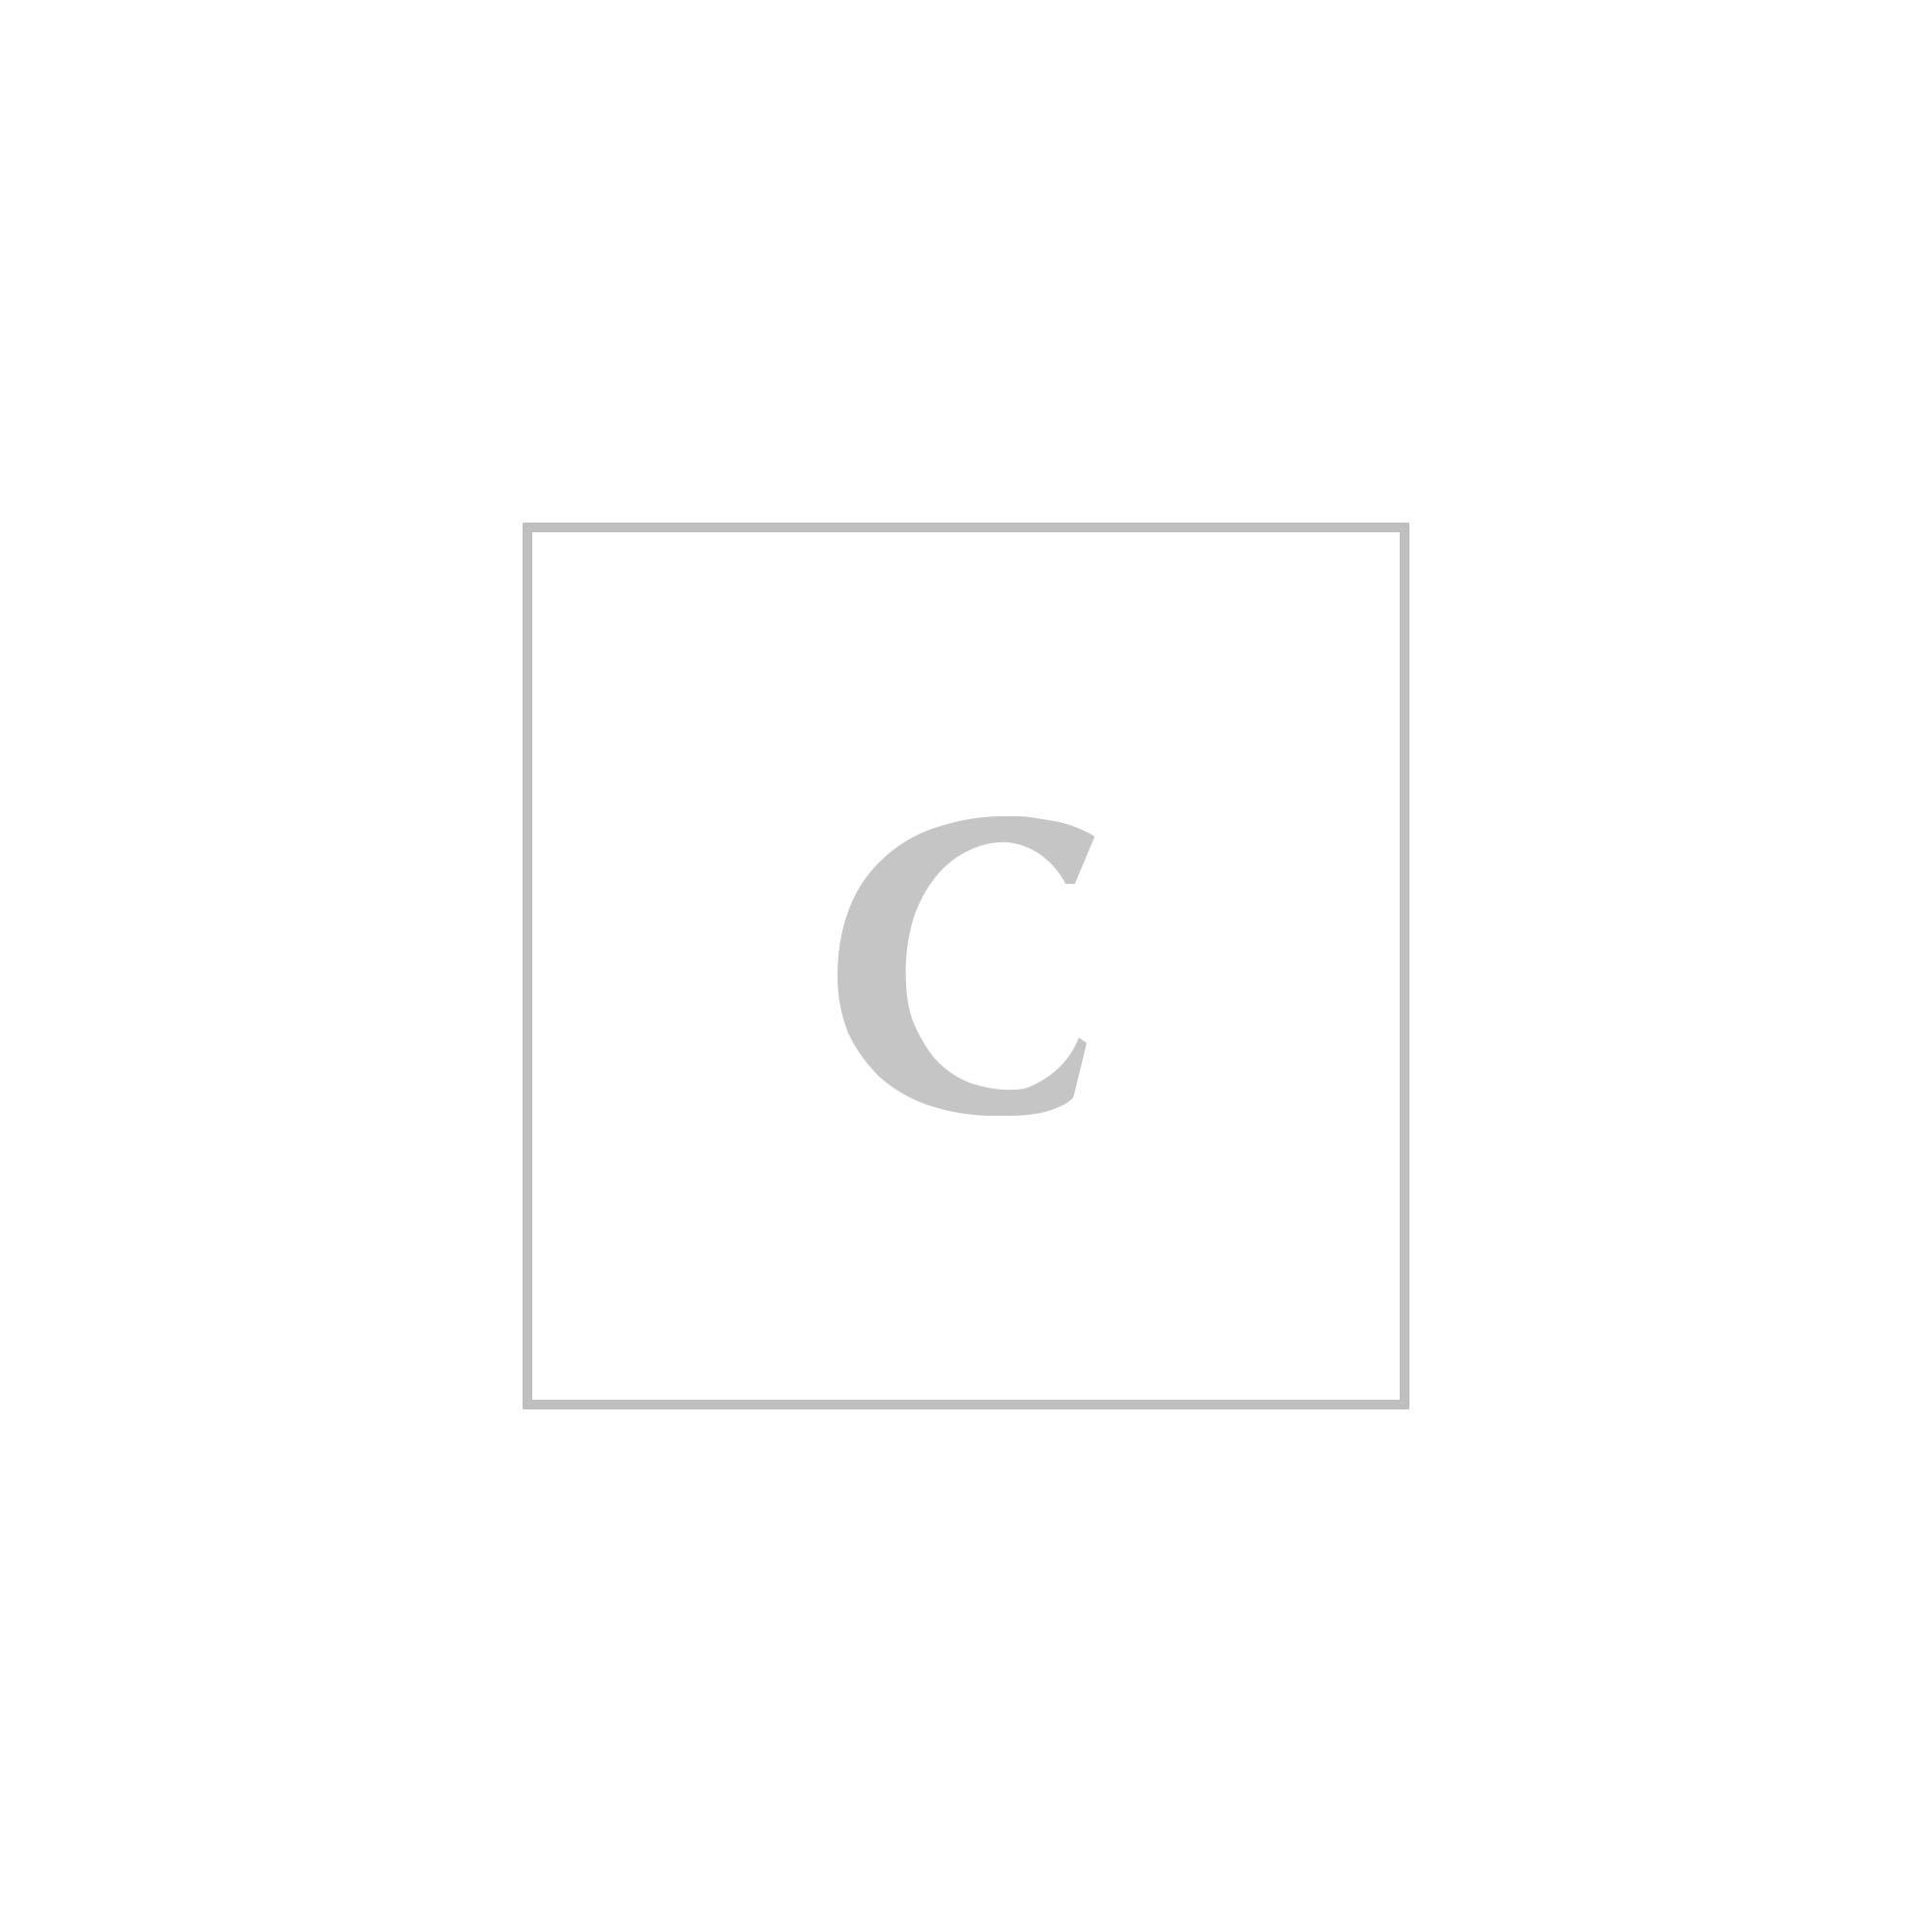 Moncler giubbotto dionne